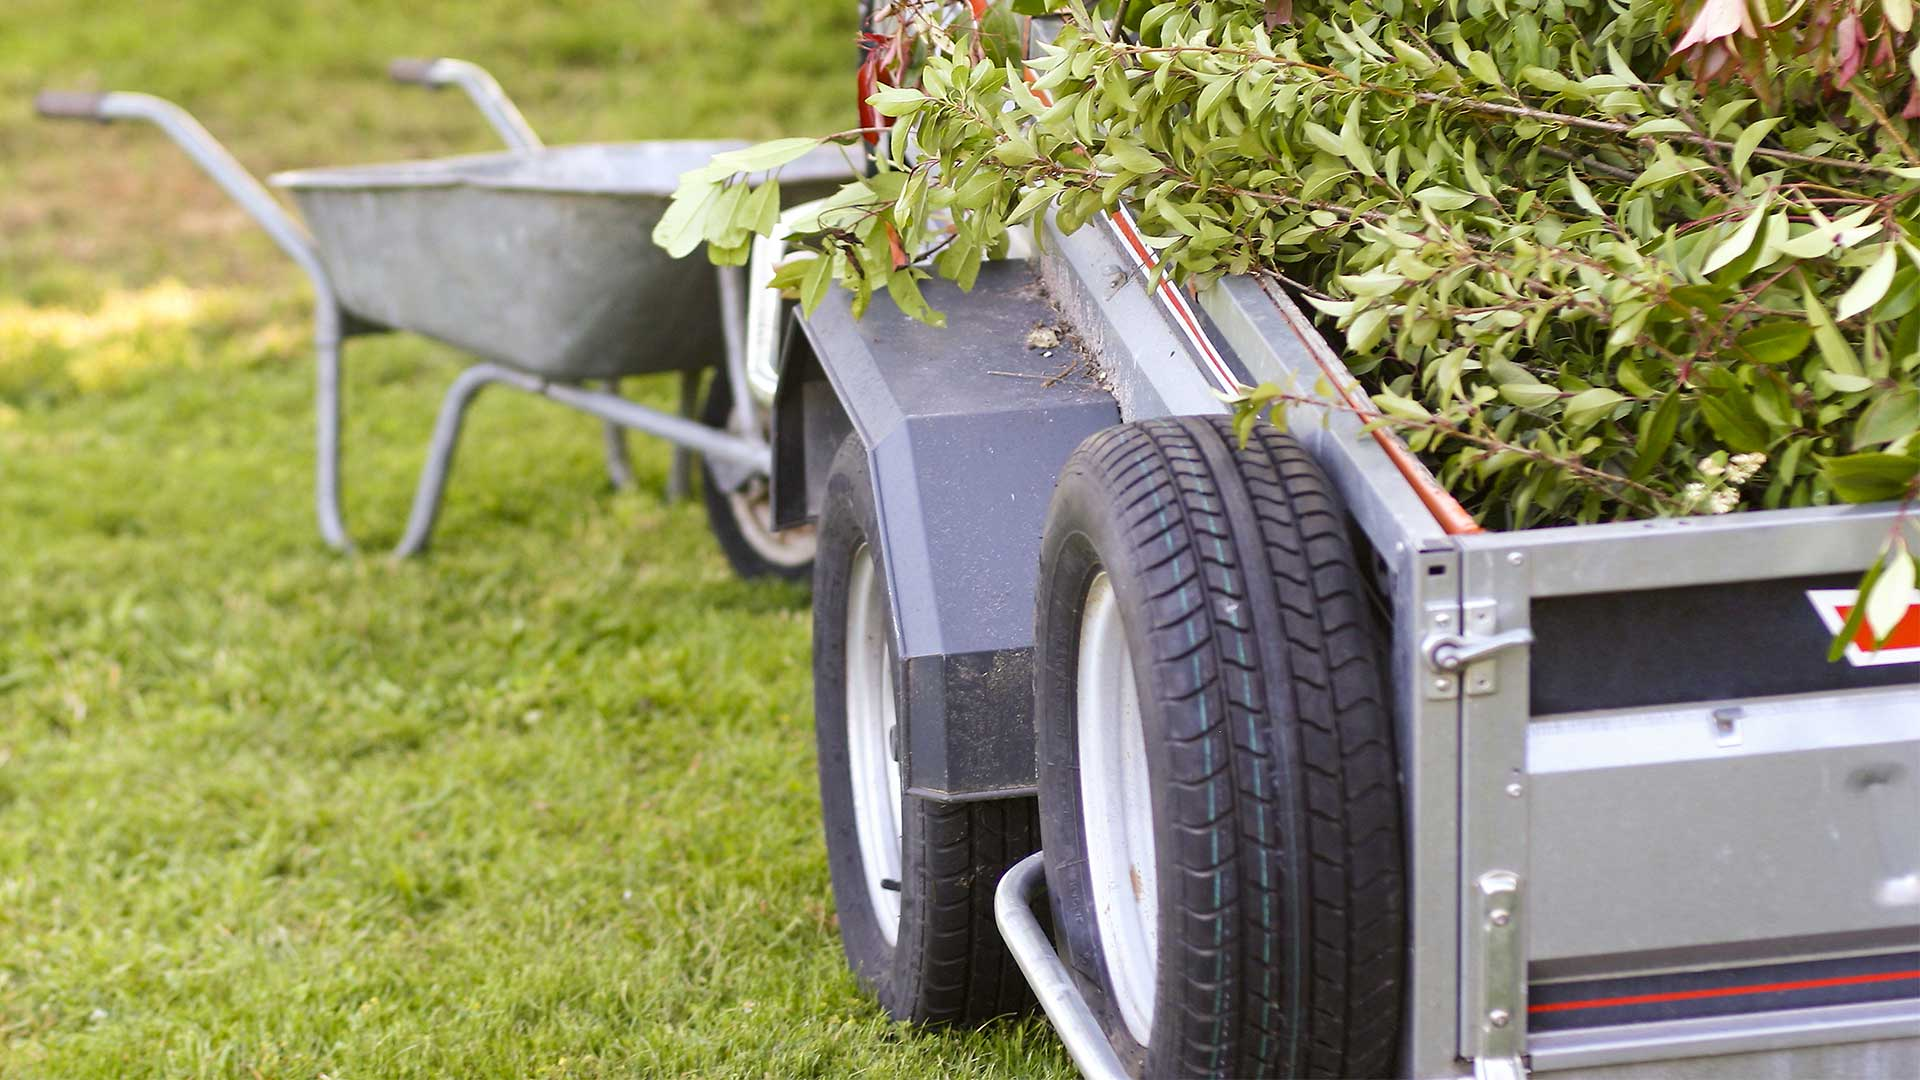 Garden Trailer Insurance